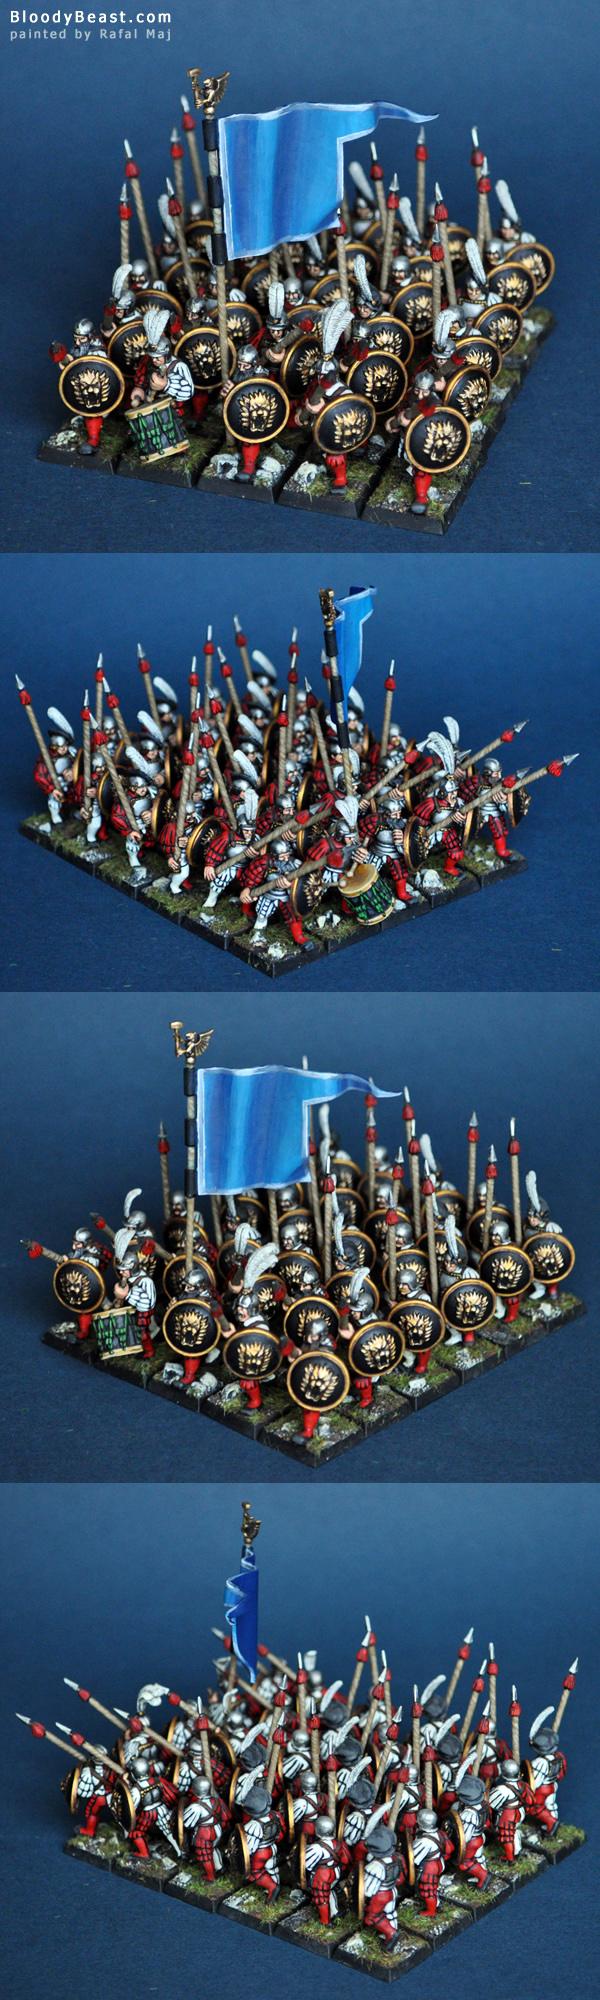 Empire Spearmen Regiment painted by Rafal Maj (BloodyBeast.com)